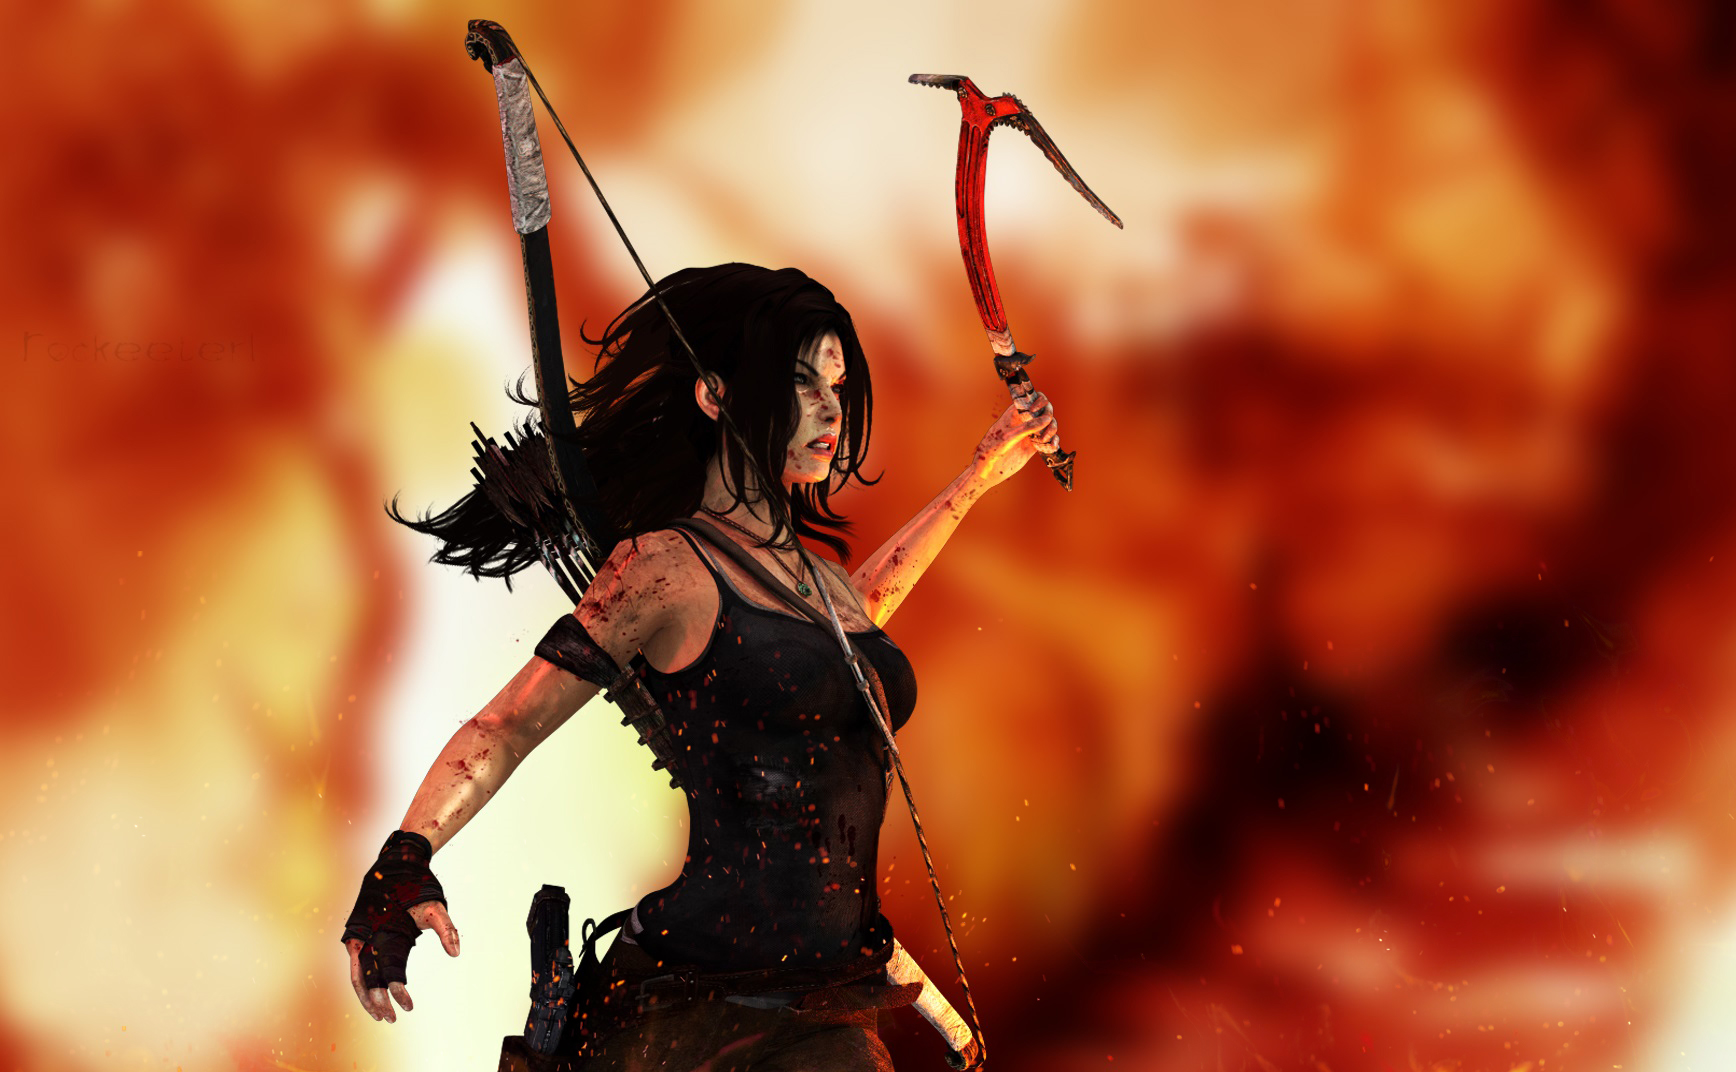 - Innocence Killed | Tomb Raider (Wallpaper) by Rockeeterl